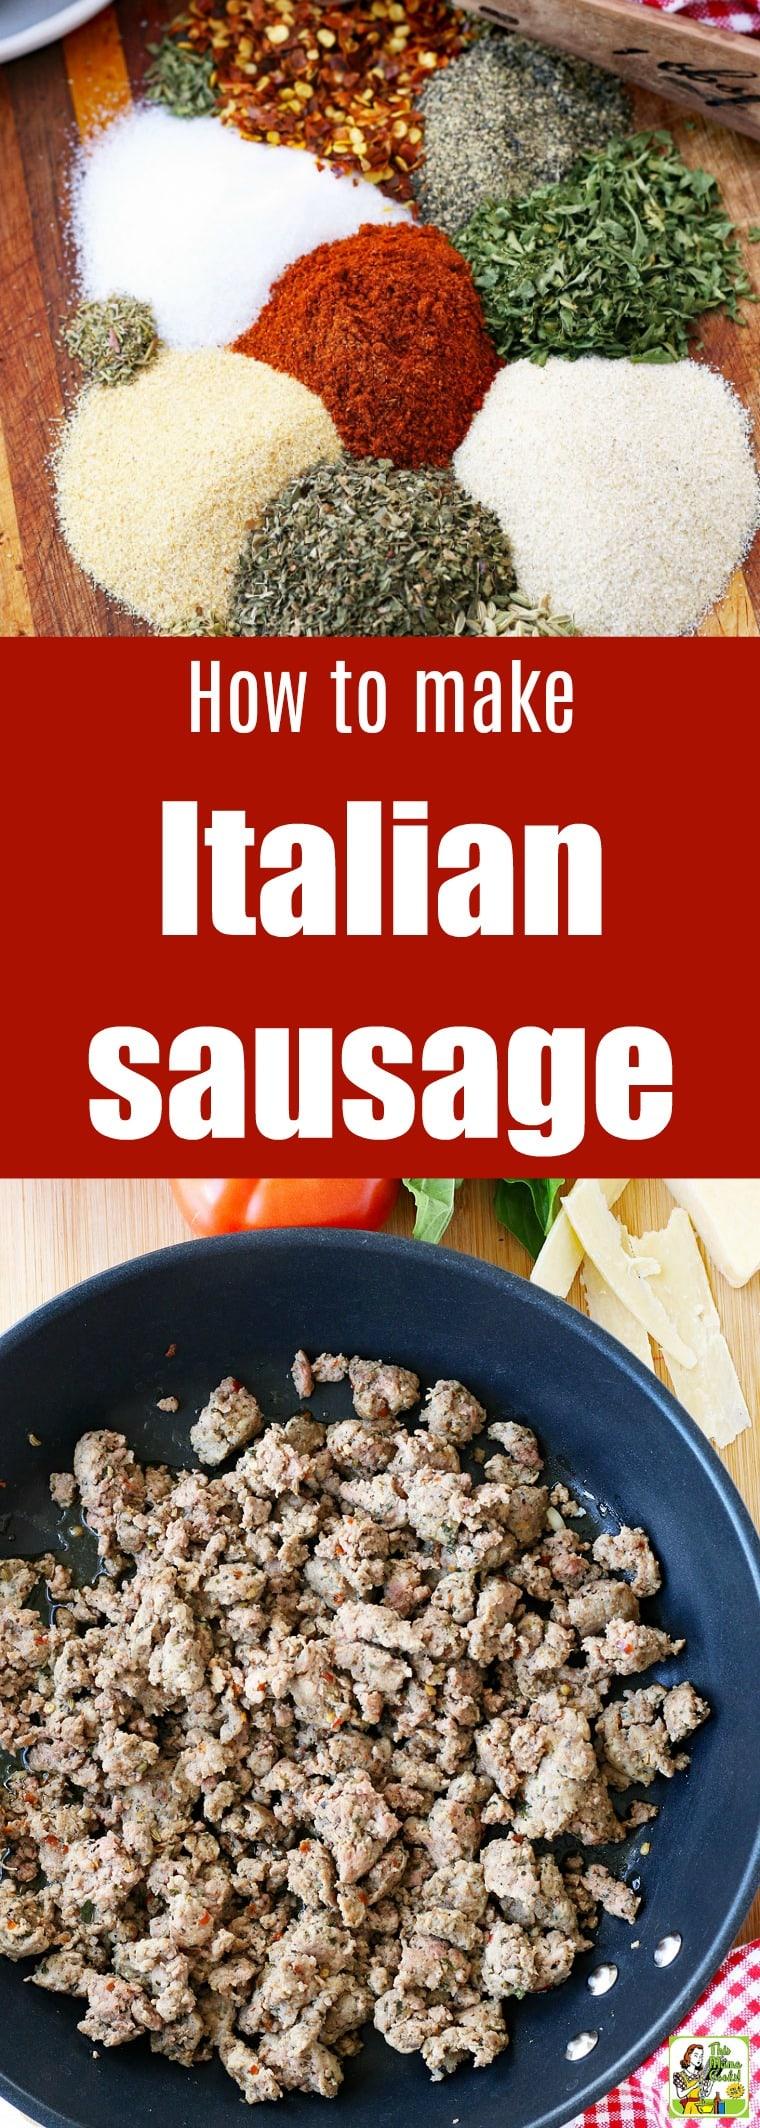 How to make a homemade Italian sausage recipe